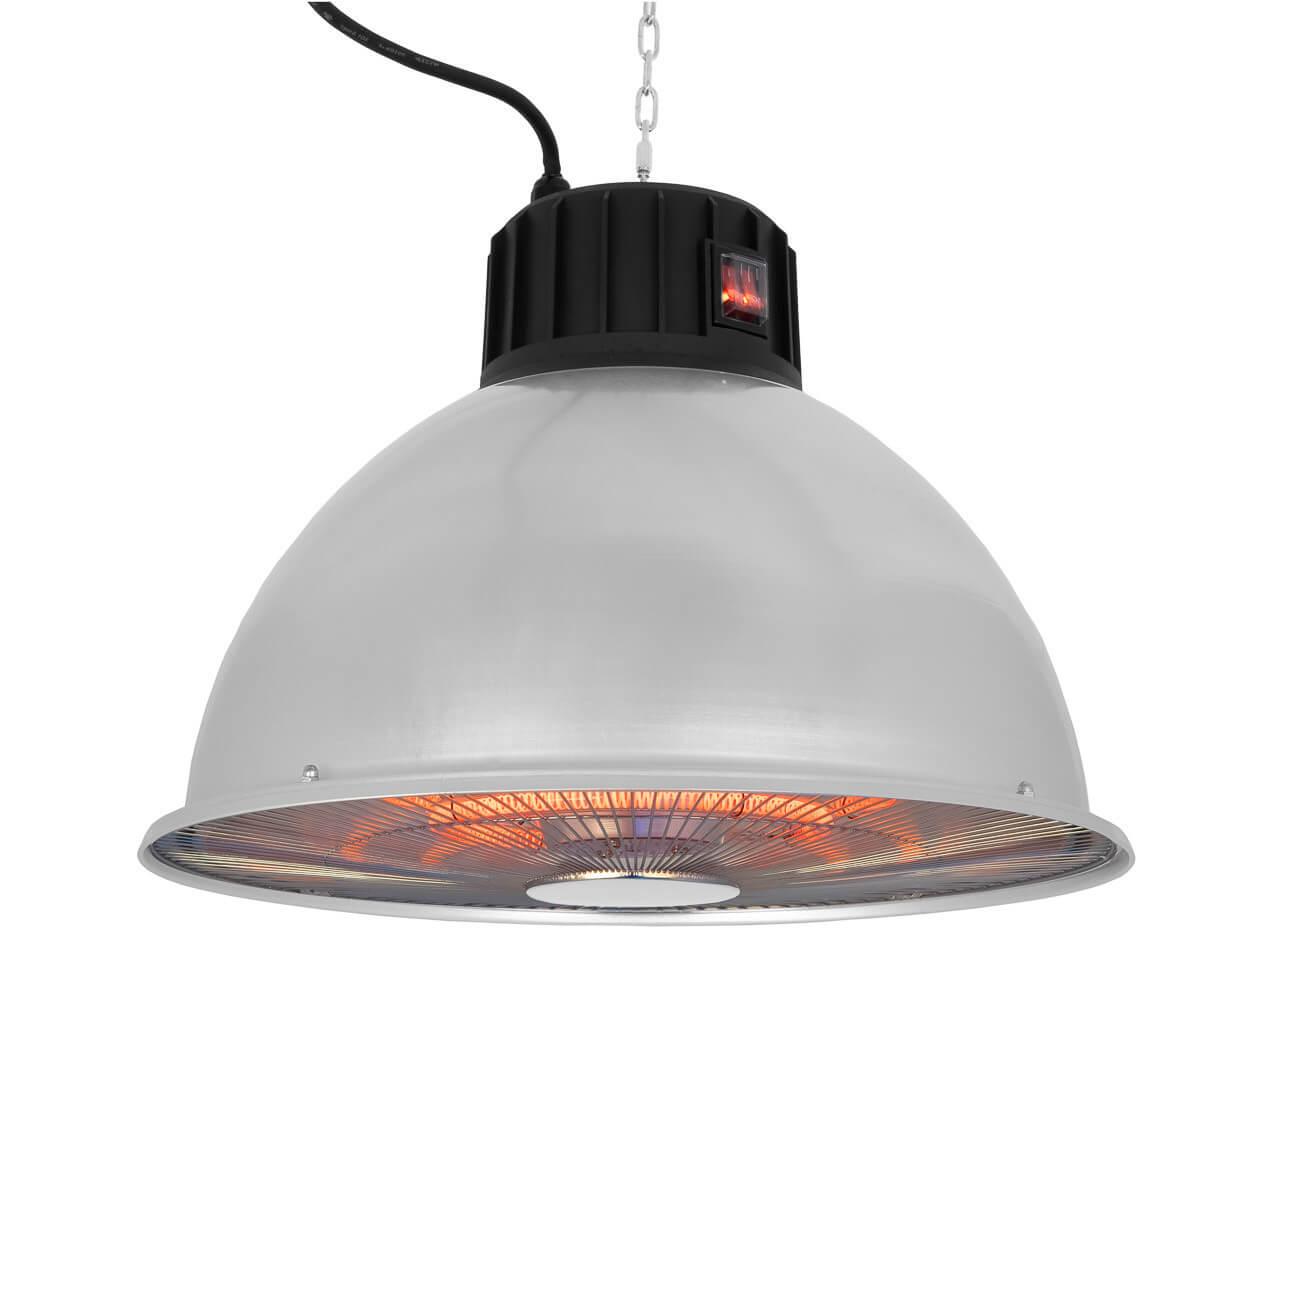 Eurom Partytent heater 1500 IND Carbon hangende infrarood terrasverwarmer ø 42 cm